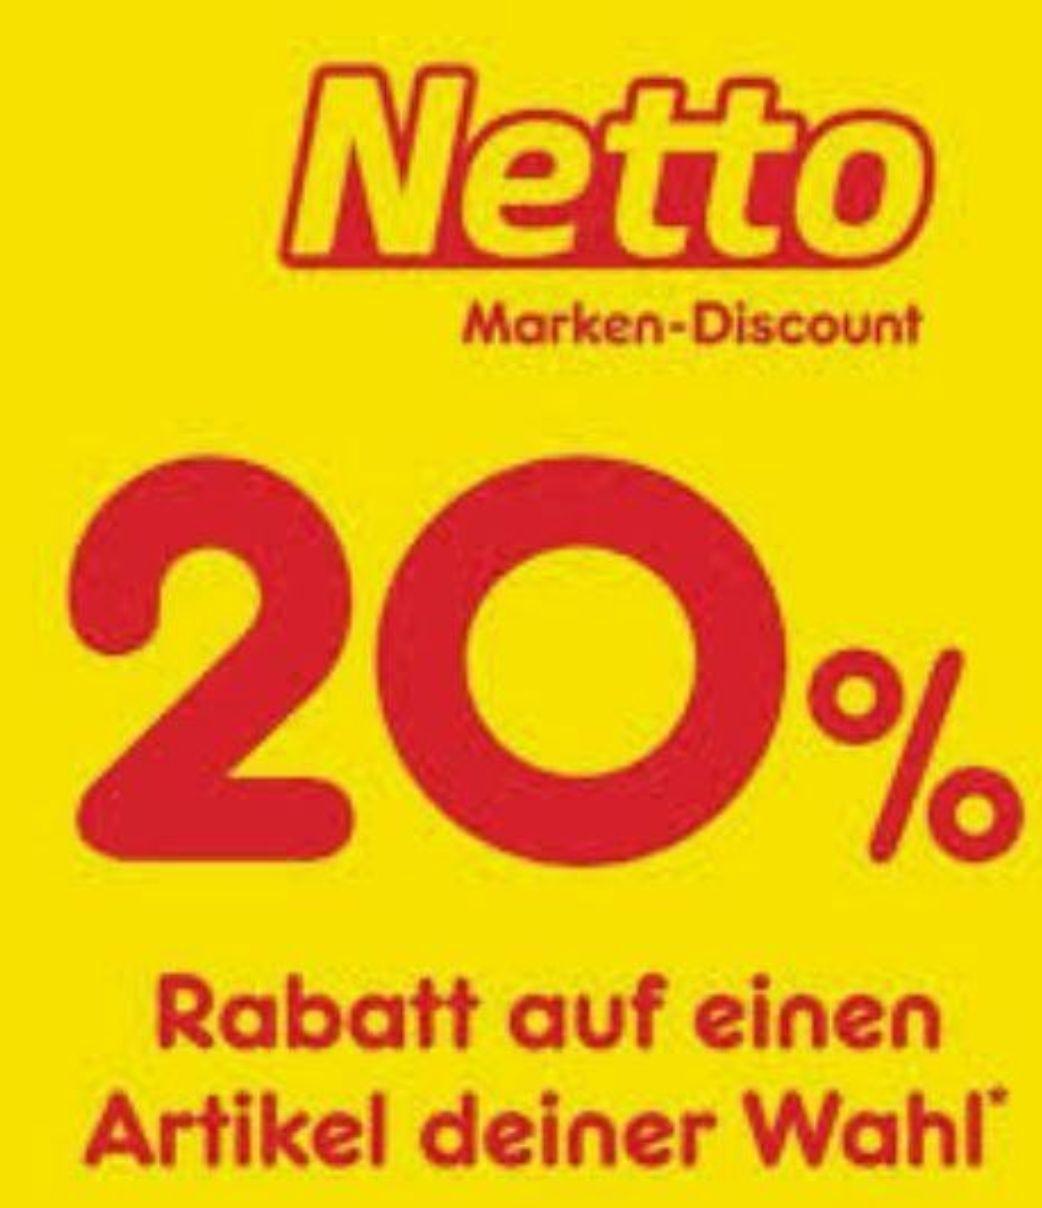 [Netto MD] Rabatt Coupons KW36 (31.08. - 05.09.), bundesweit einsetzbar